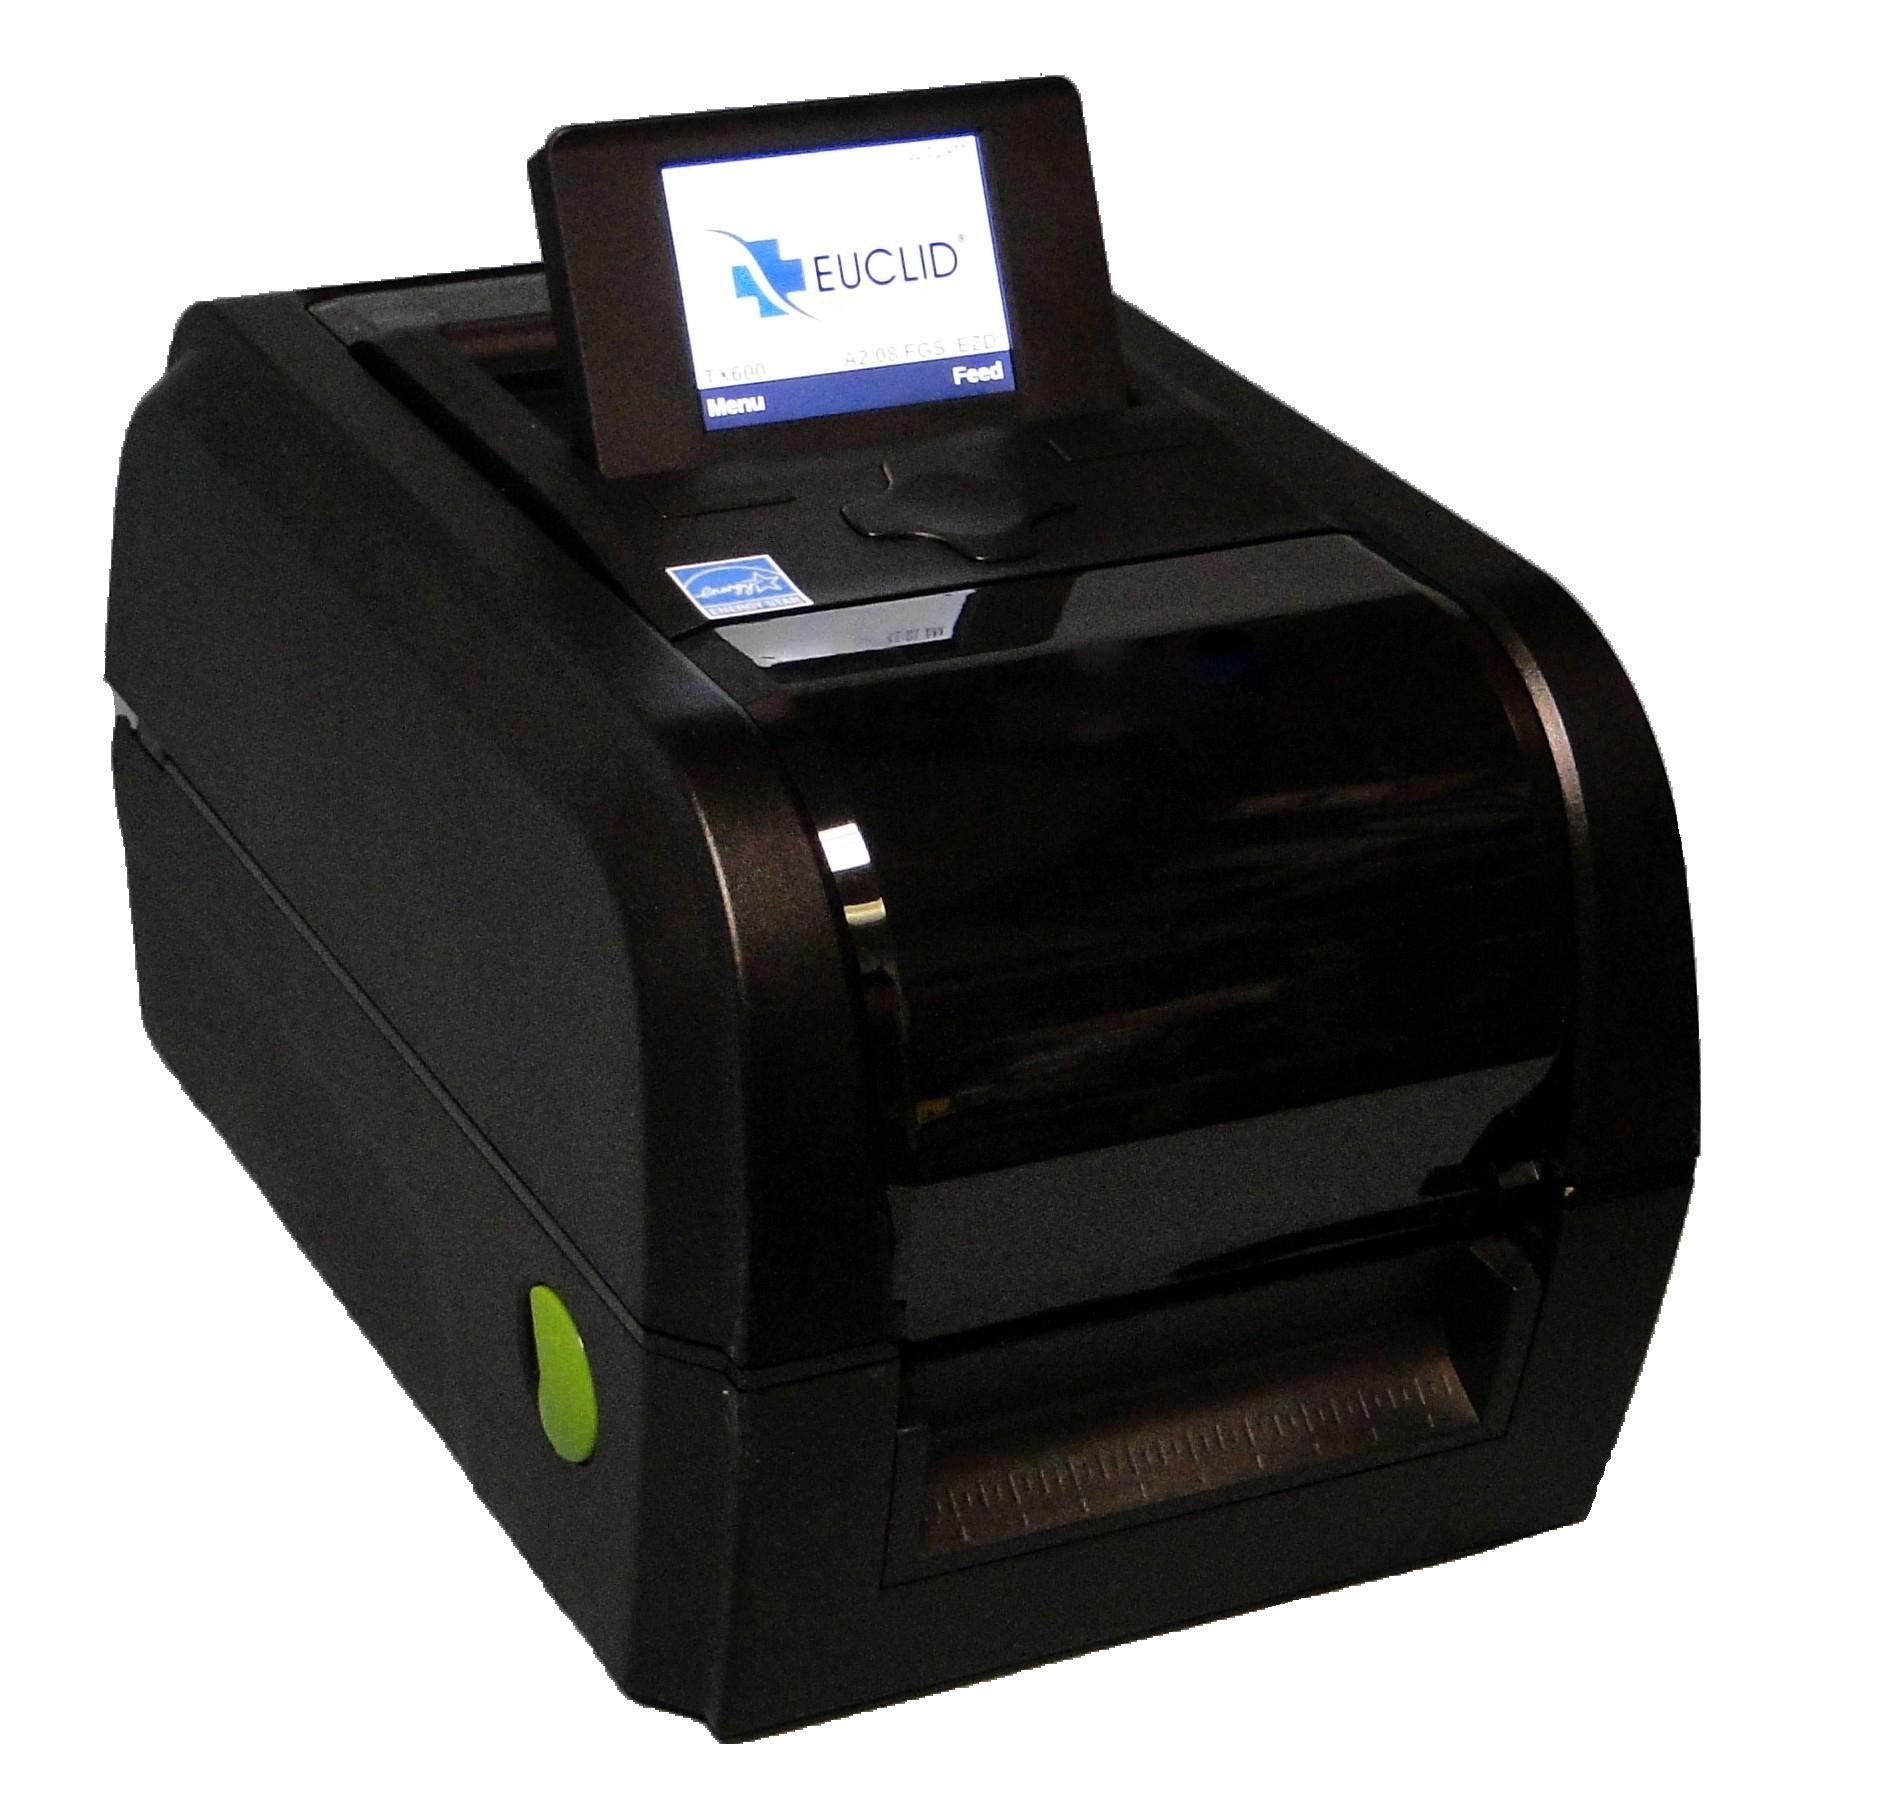 Vantage Label Printer